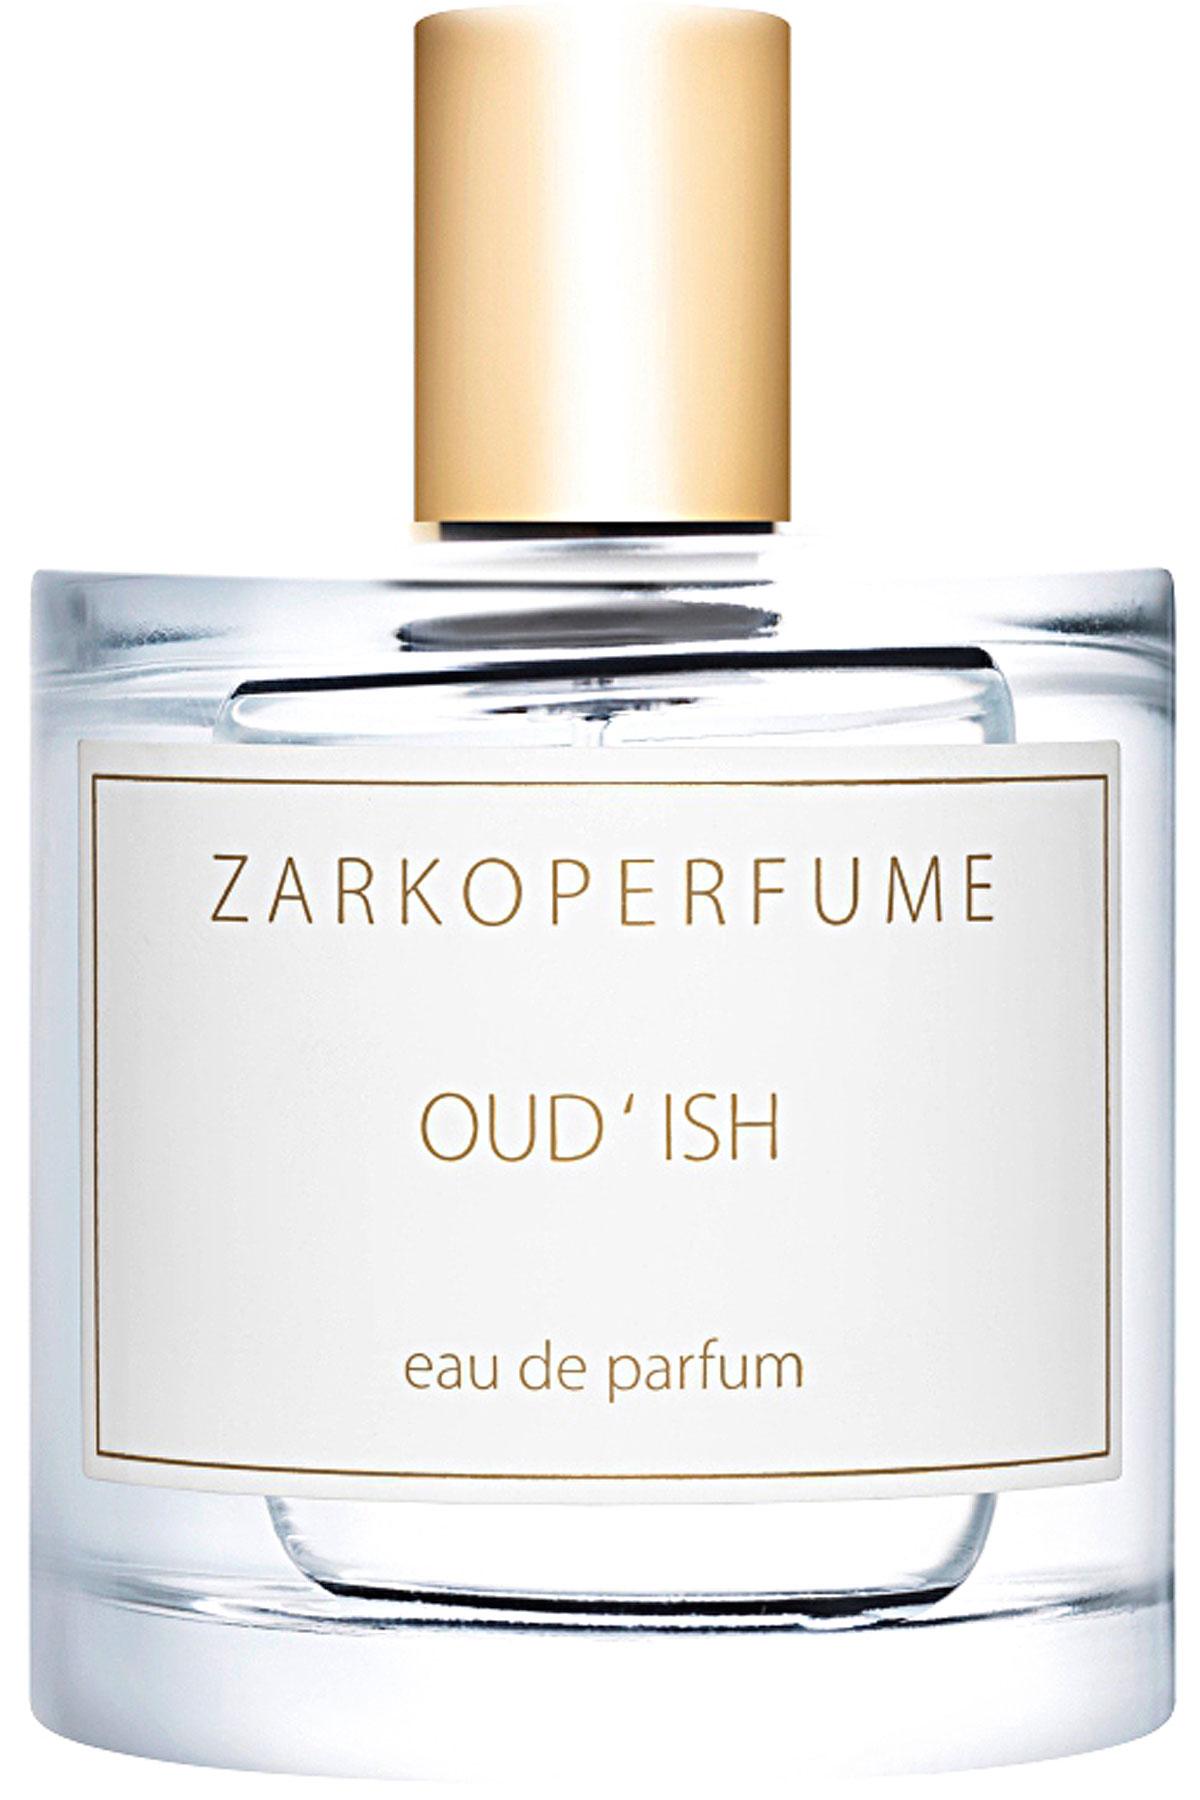 Zarkoperfume Fragrances for Men, Oud Ish - Eau De Parfum - 100 Ml, 2019, 100 ml